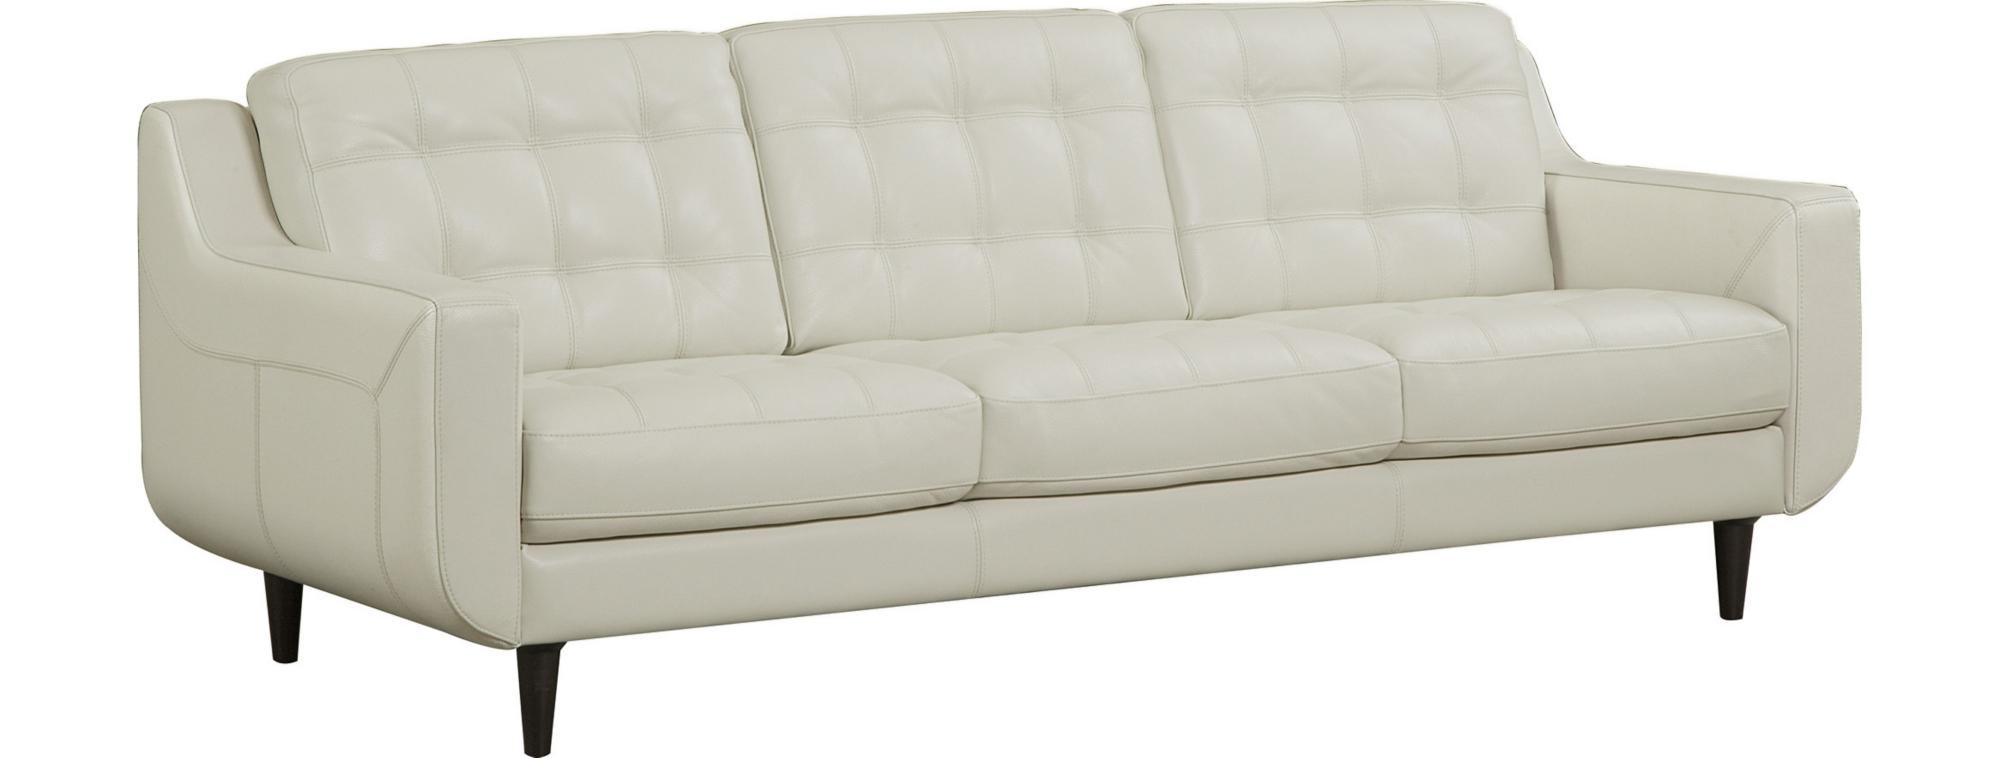 Ledersofa modern beige  Sofas | Havertys